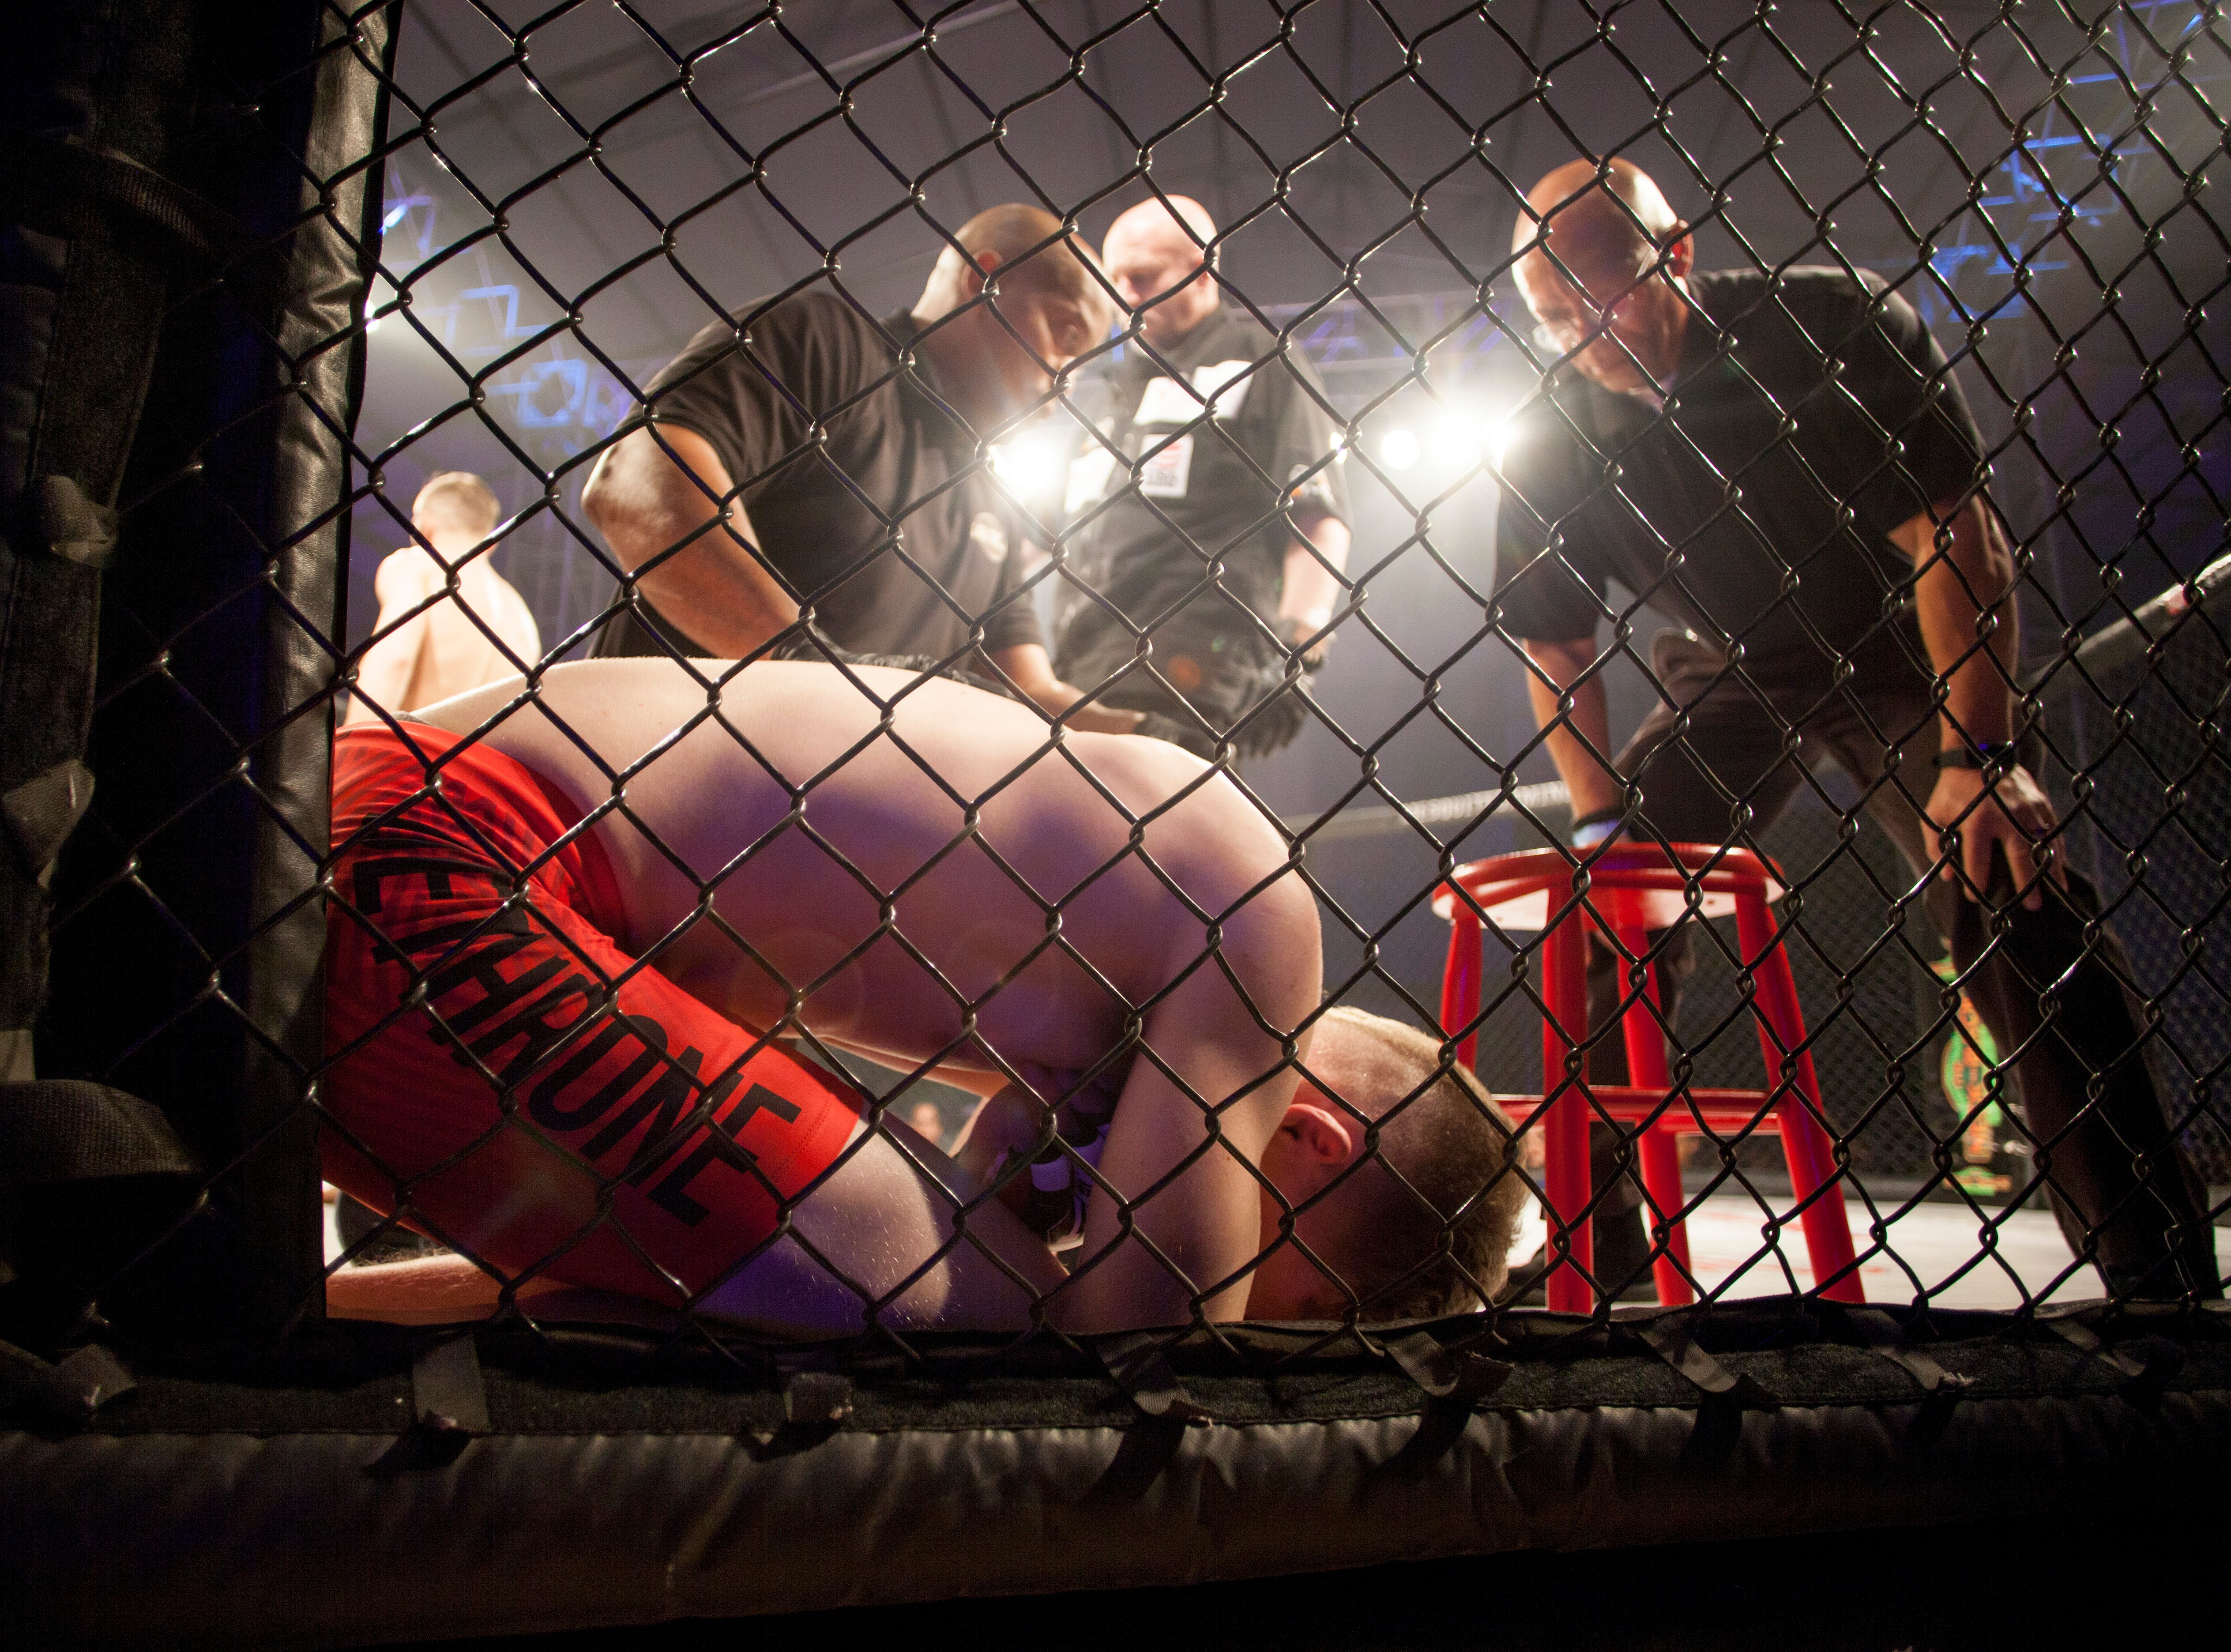 Vance Elrod, in the blue corner, defeats Morgun Colledge during Mayhem in Mesquite at the Casablanca Saturday, Dec. 15, 2018.